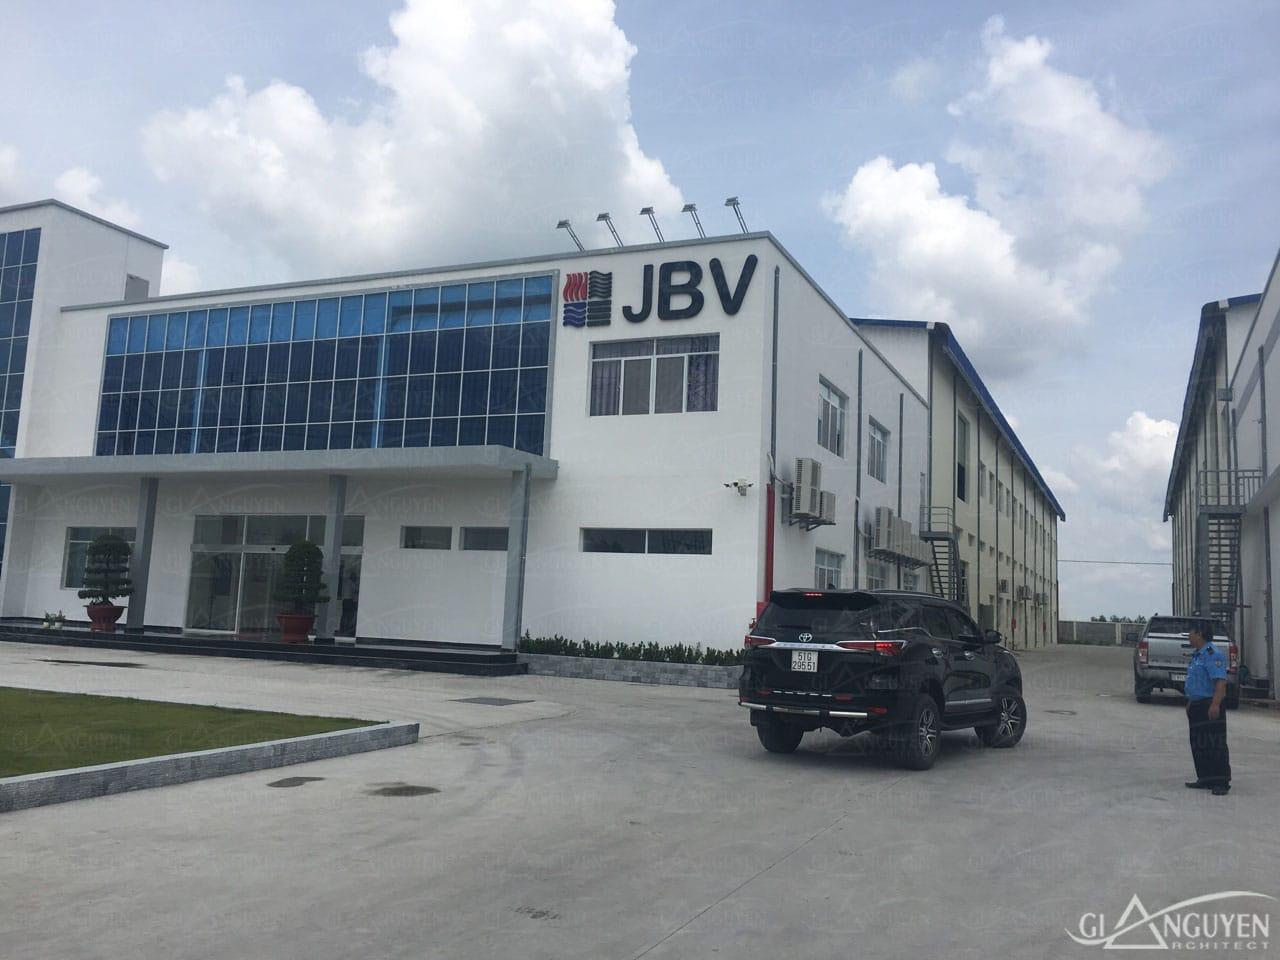 jbv 1